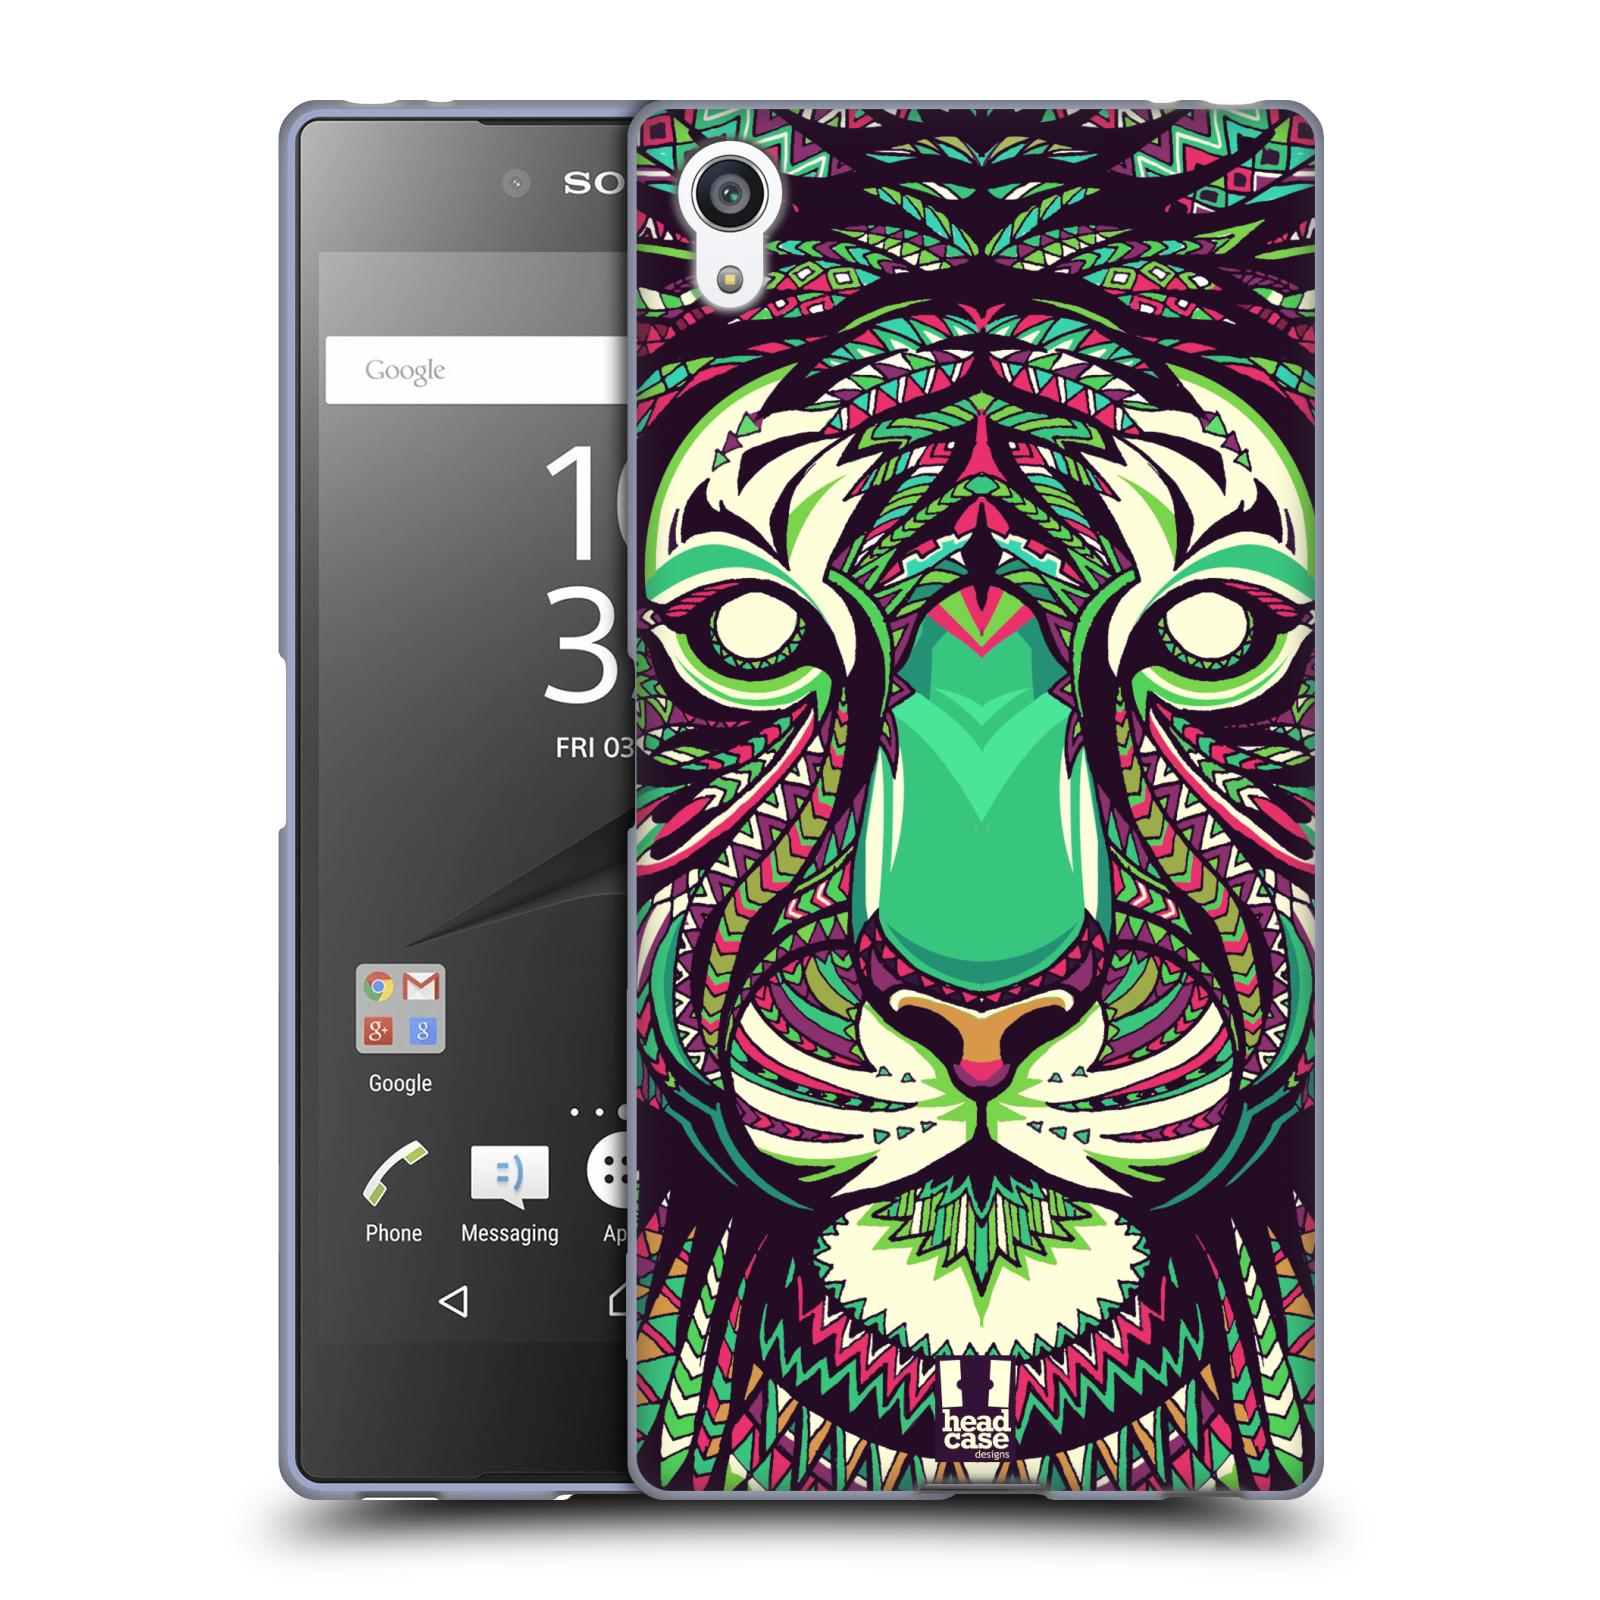 Silikonové pouzdro na mobil Sony Xperia Z5 Premium HEAD CASE AZTEC TYGR